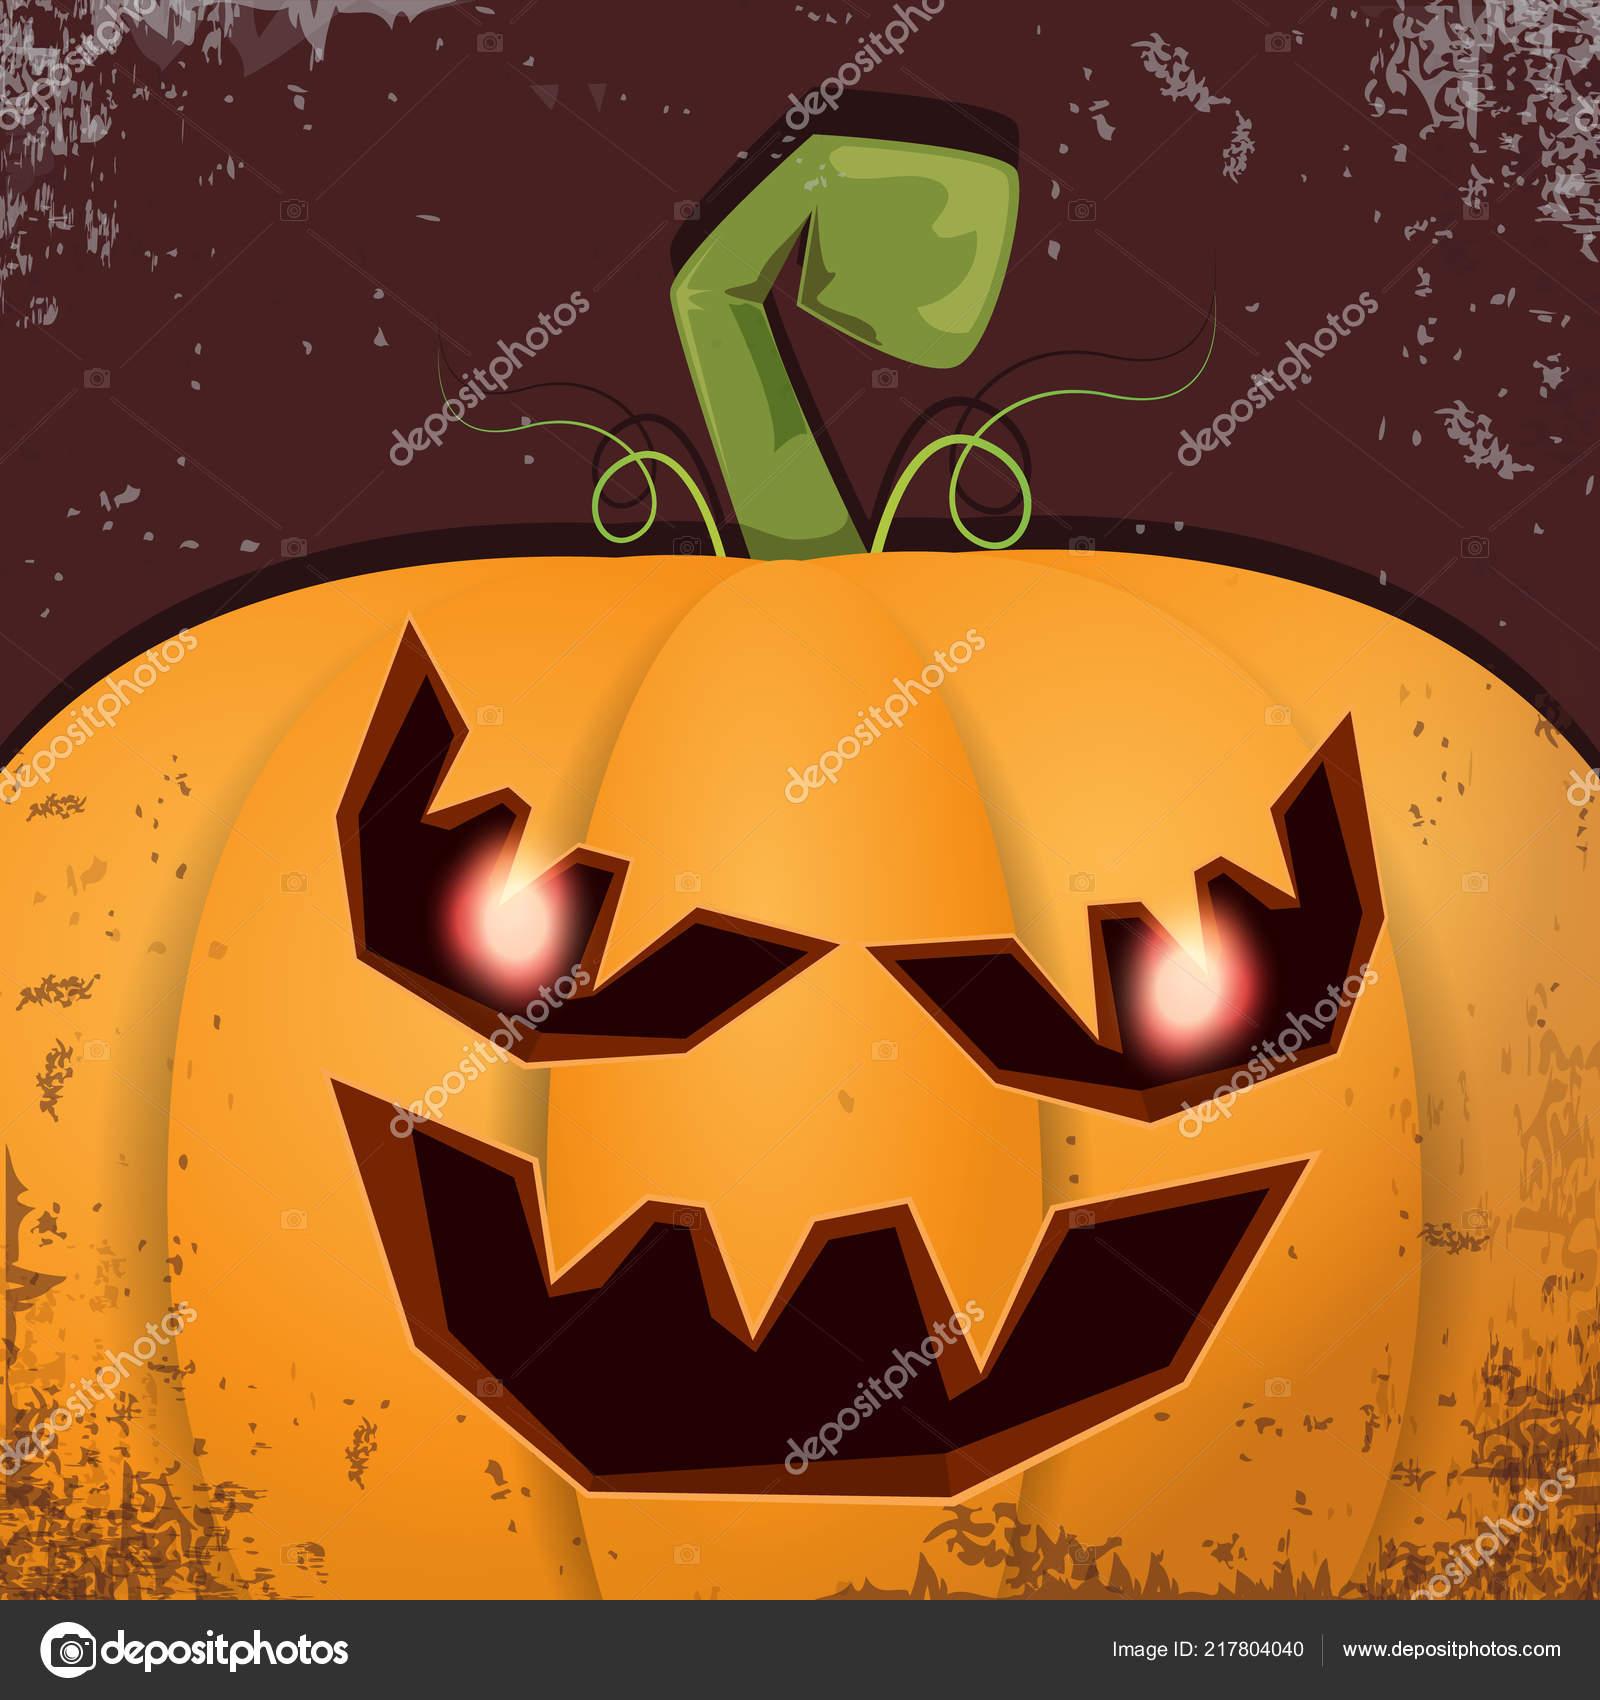 Dessin Anime Halloween Jack.Halloween Citrouille Au Visage Effrayant Image Vectorielle Zm1ter C 217804040